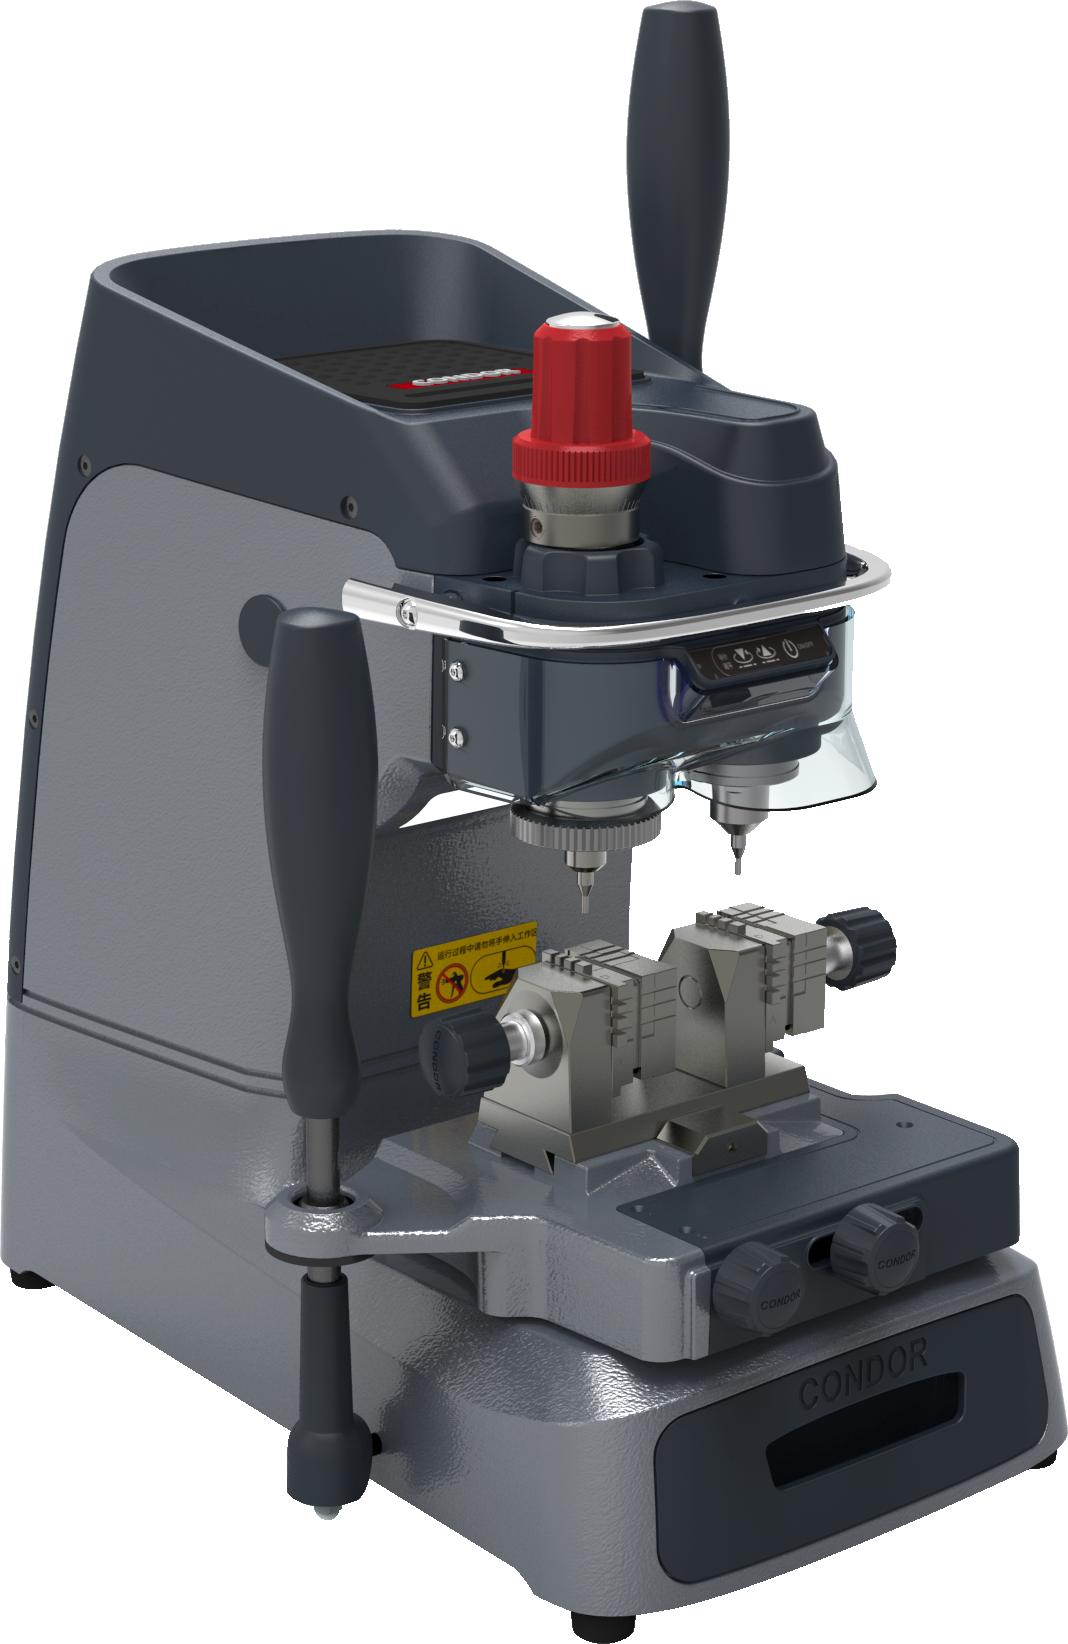 Condor Xc 002 Automobile Key Cutting Machine At Rs 110000